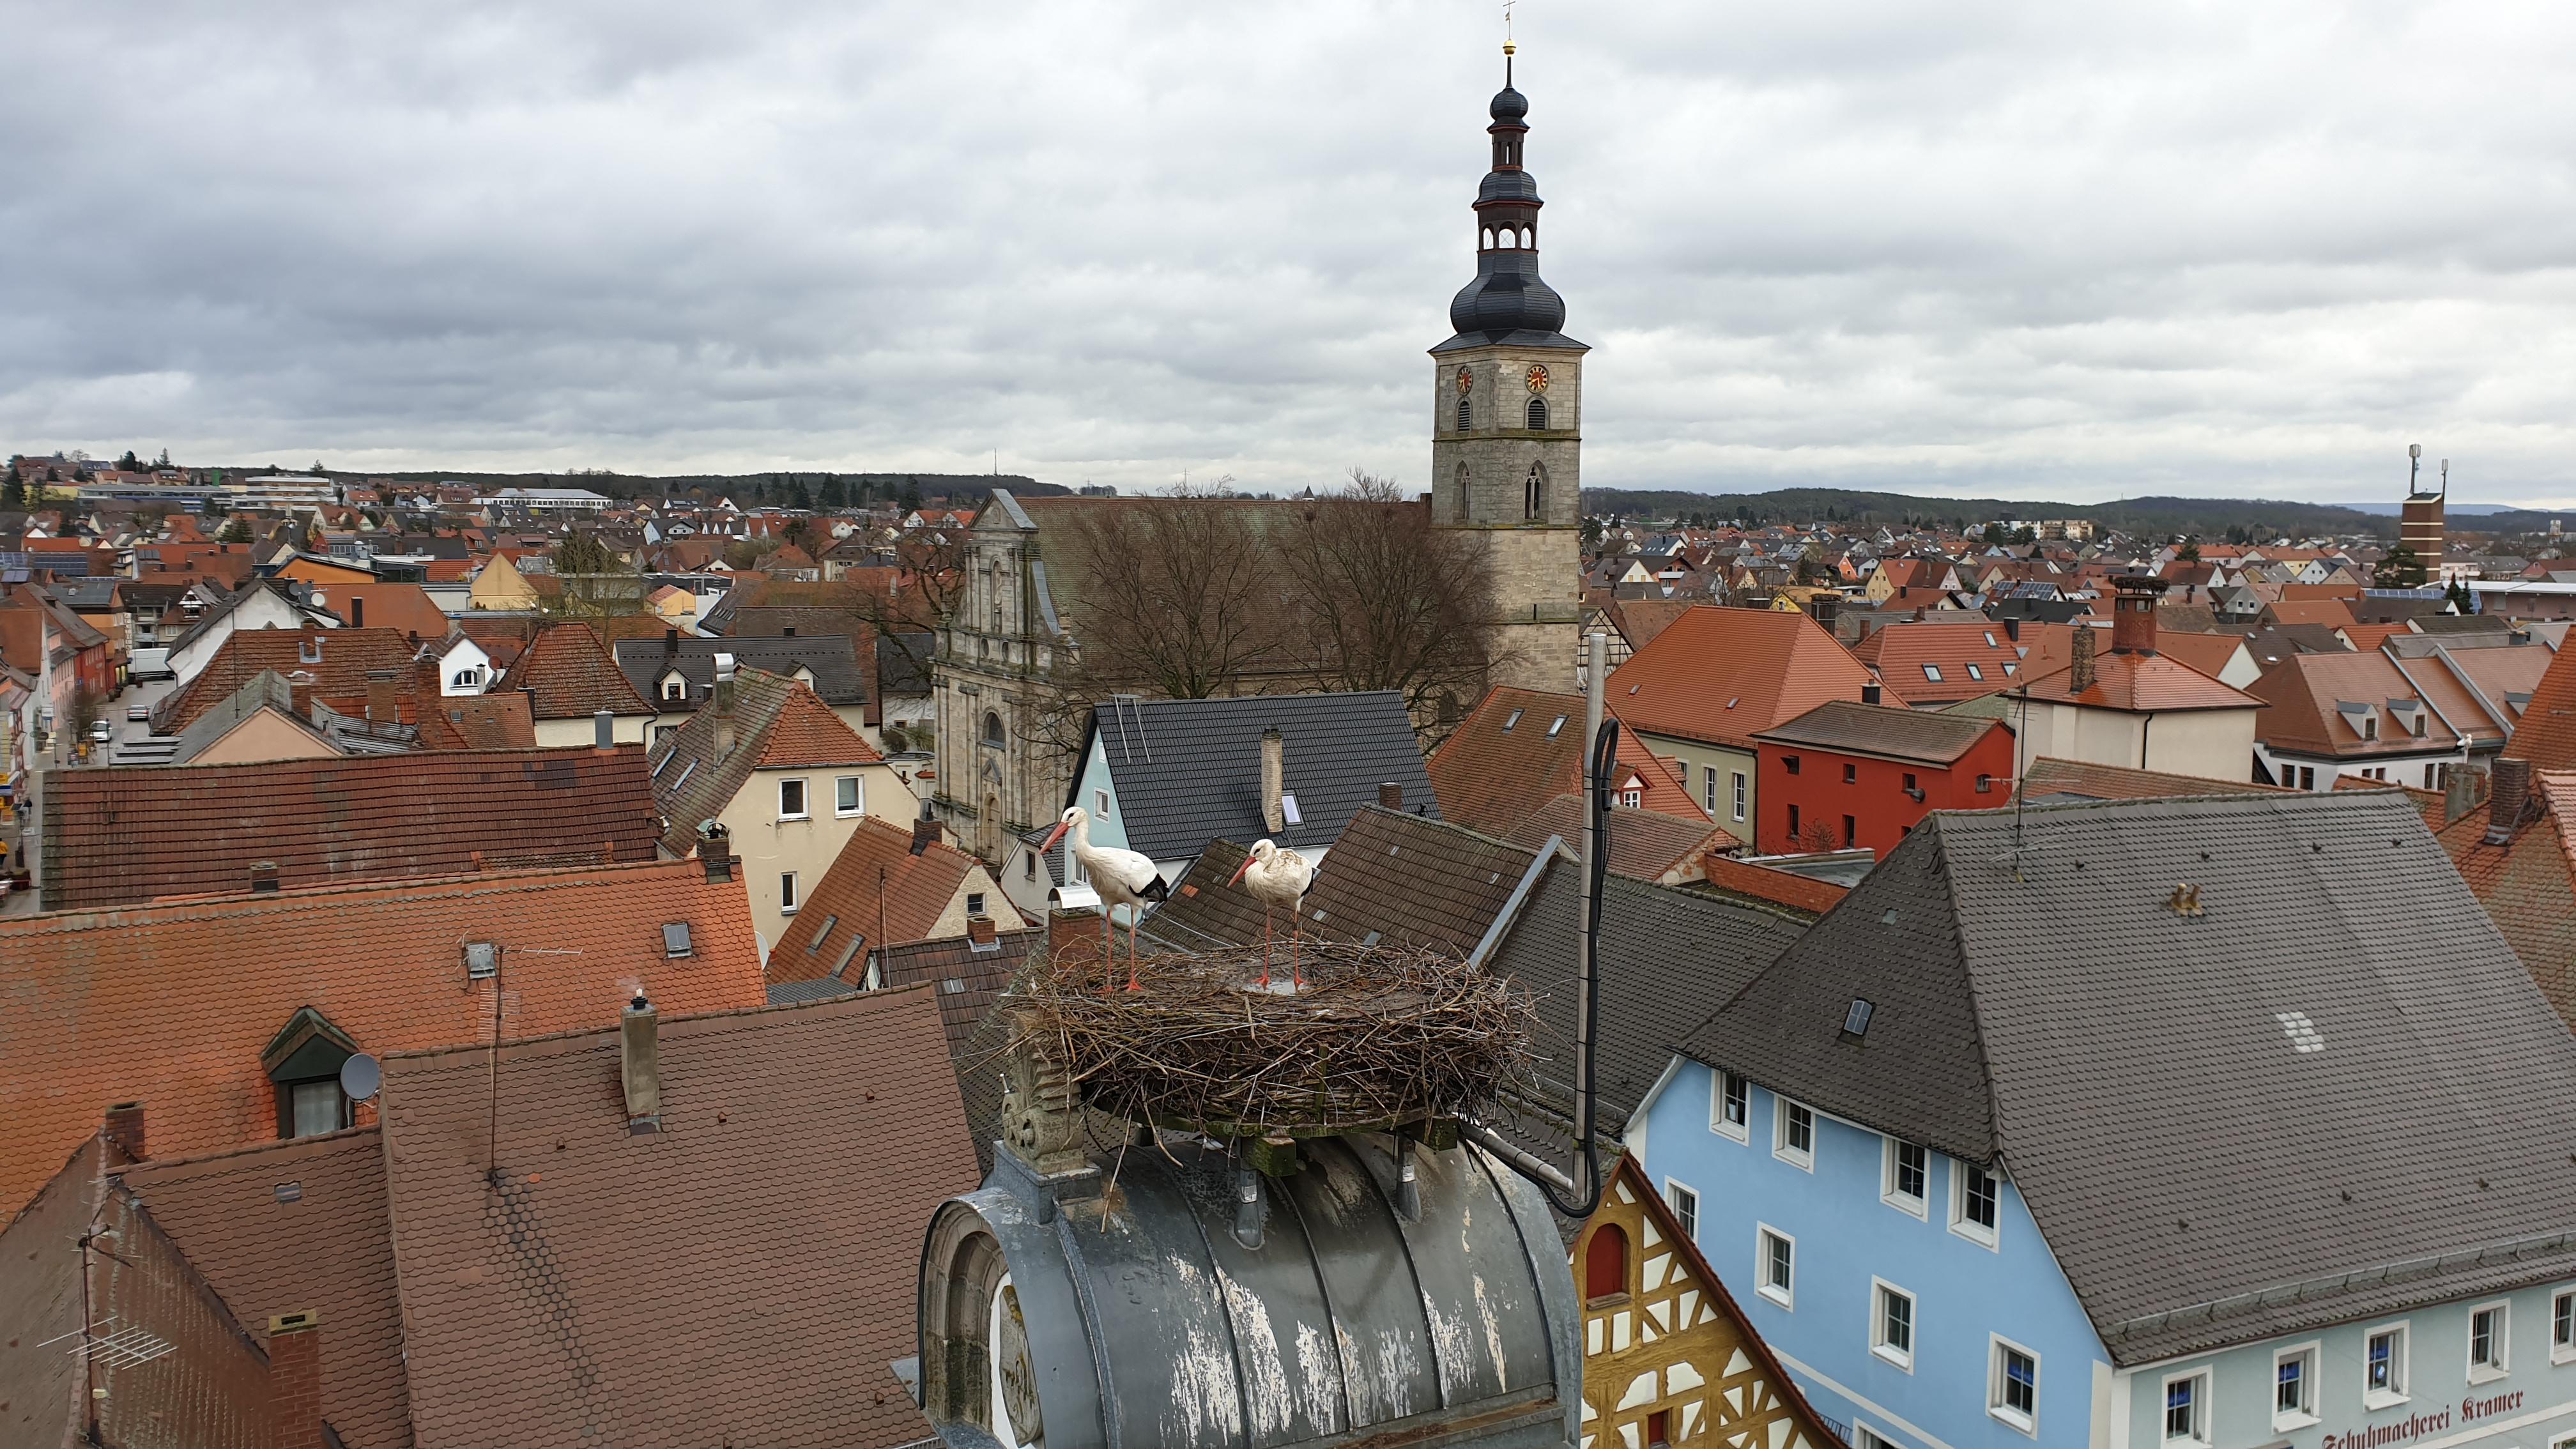 https://storchennest-hoechstadt.de/sites/default/files/storch.jpg?1341138731